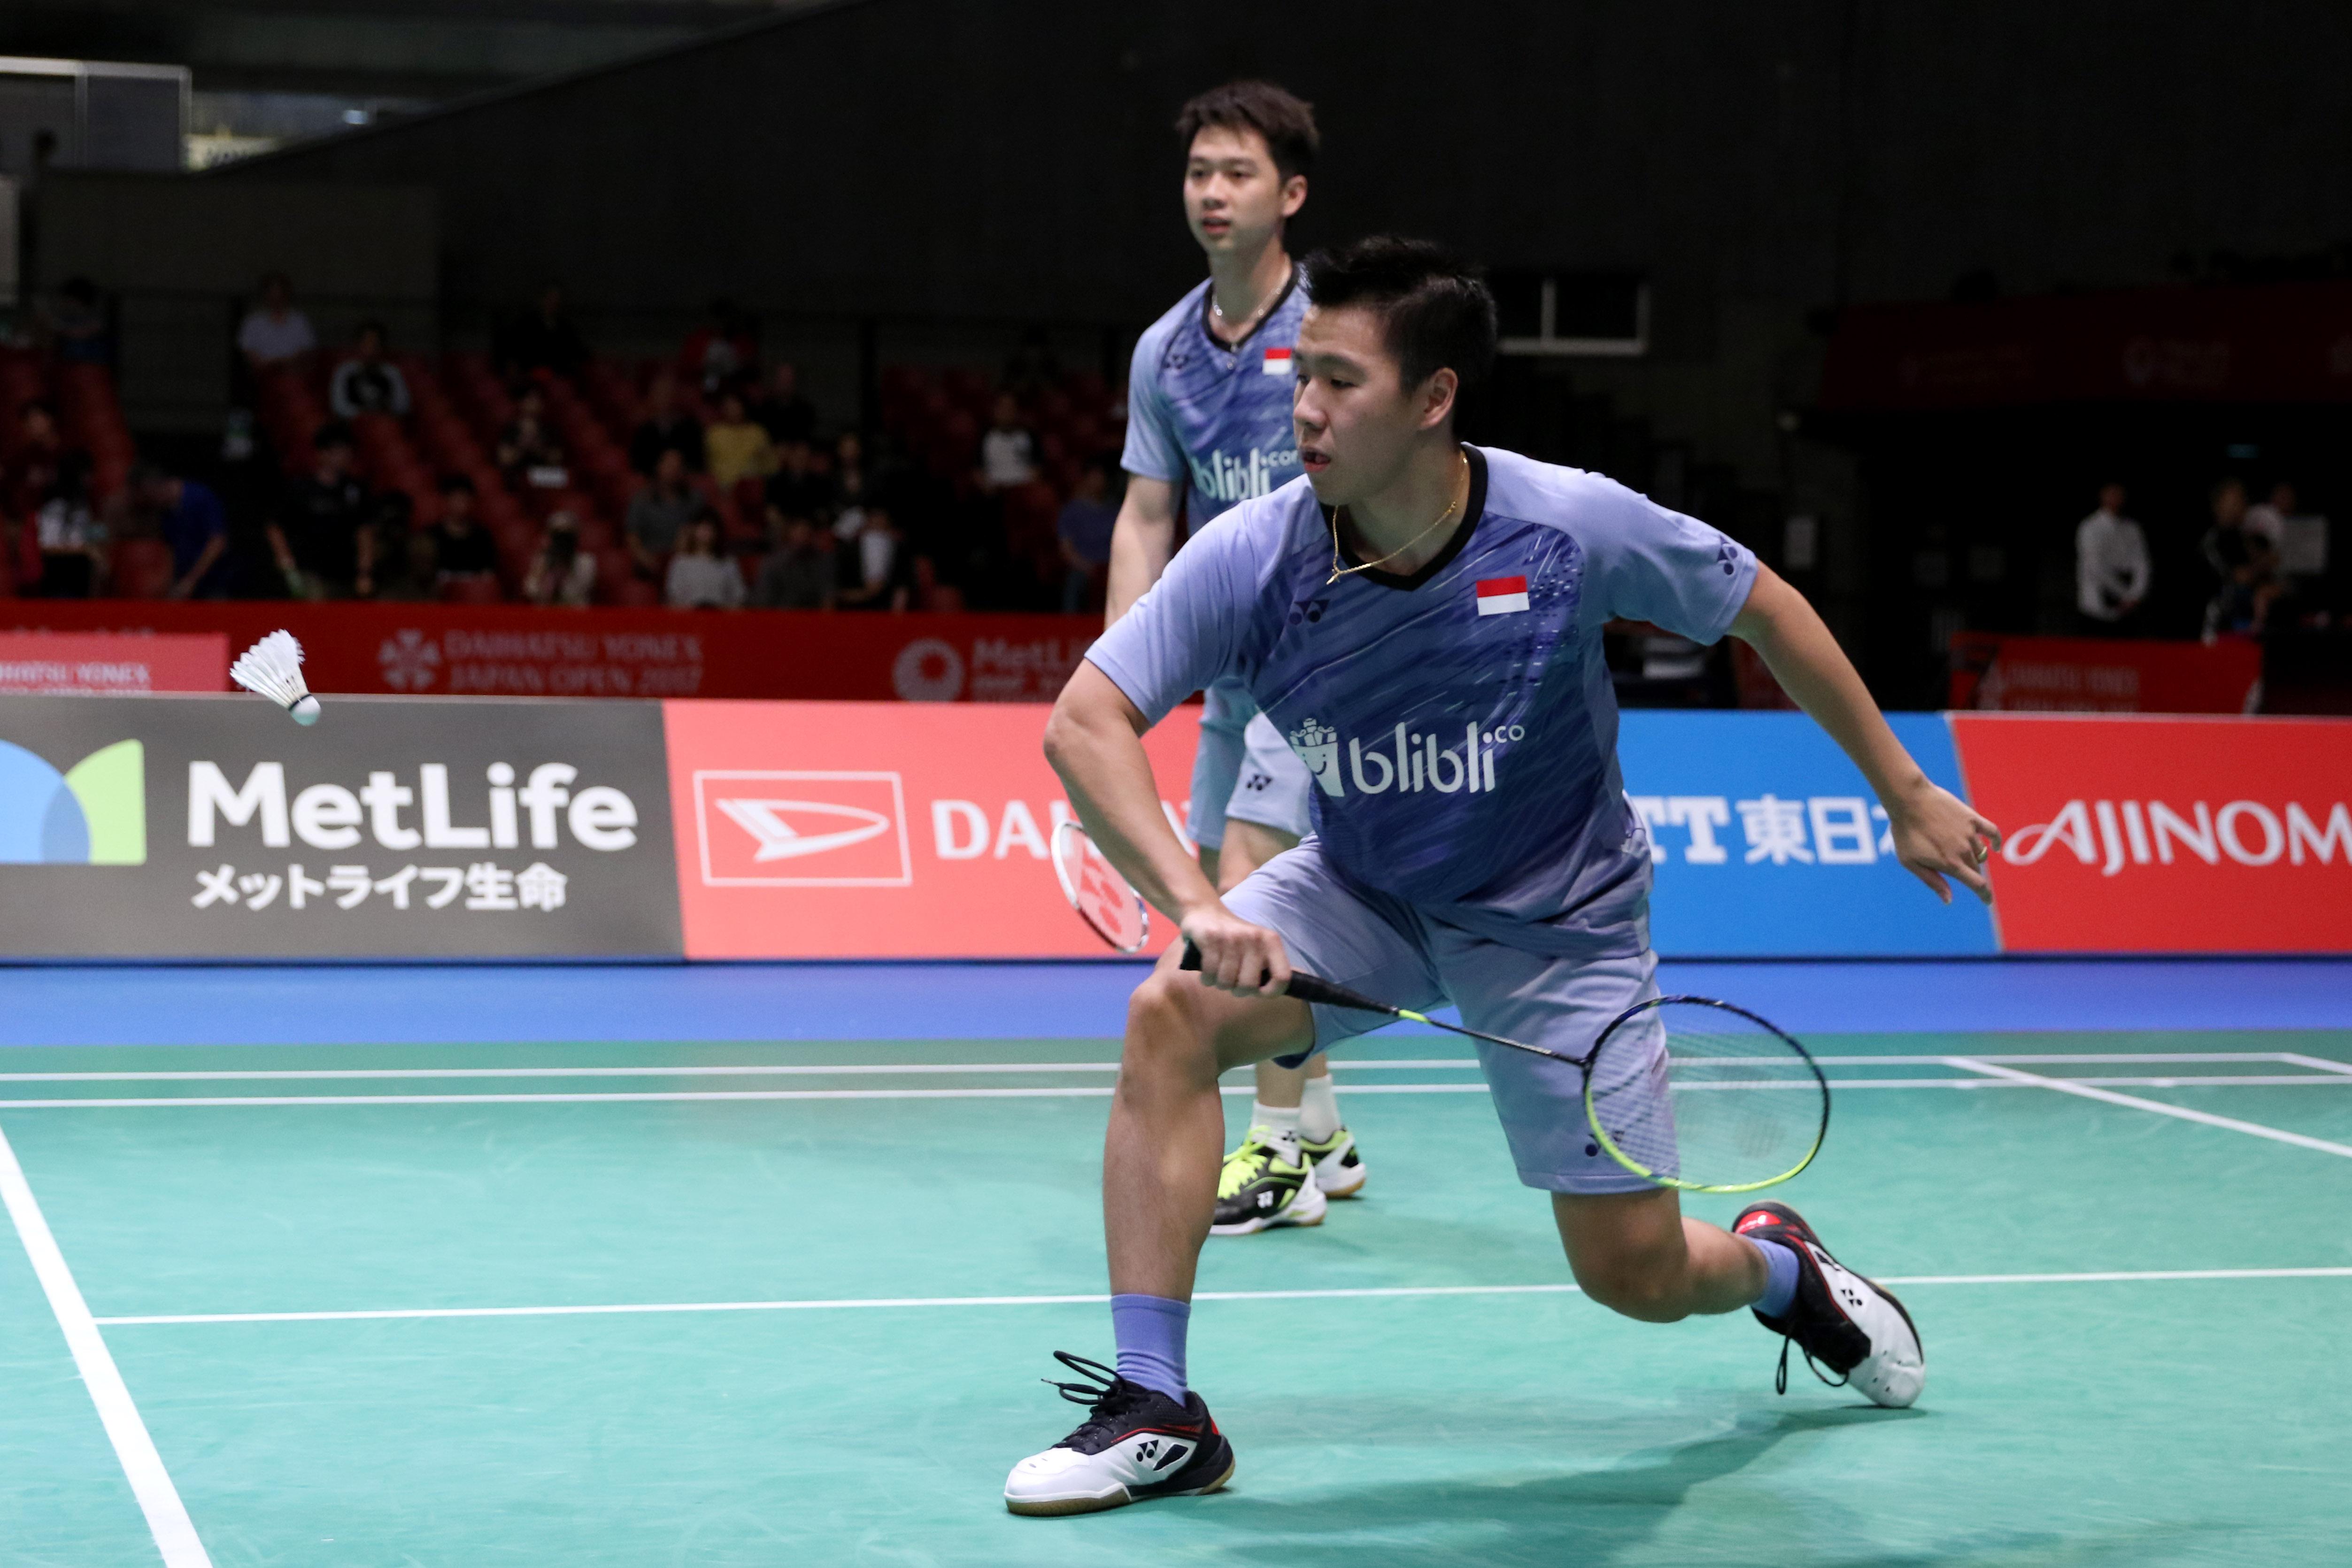 Djarum Badminton Japan Open Superseries 2017 Lolos ke Semifinal